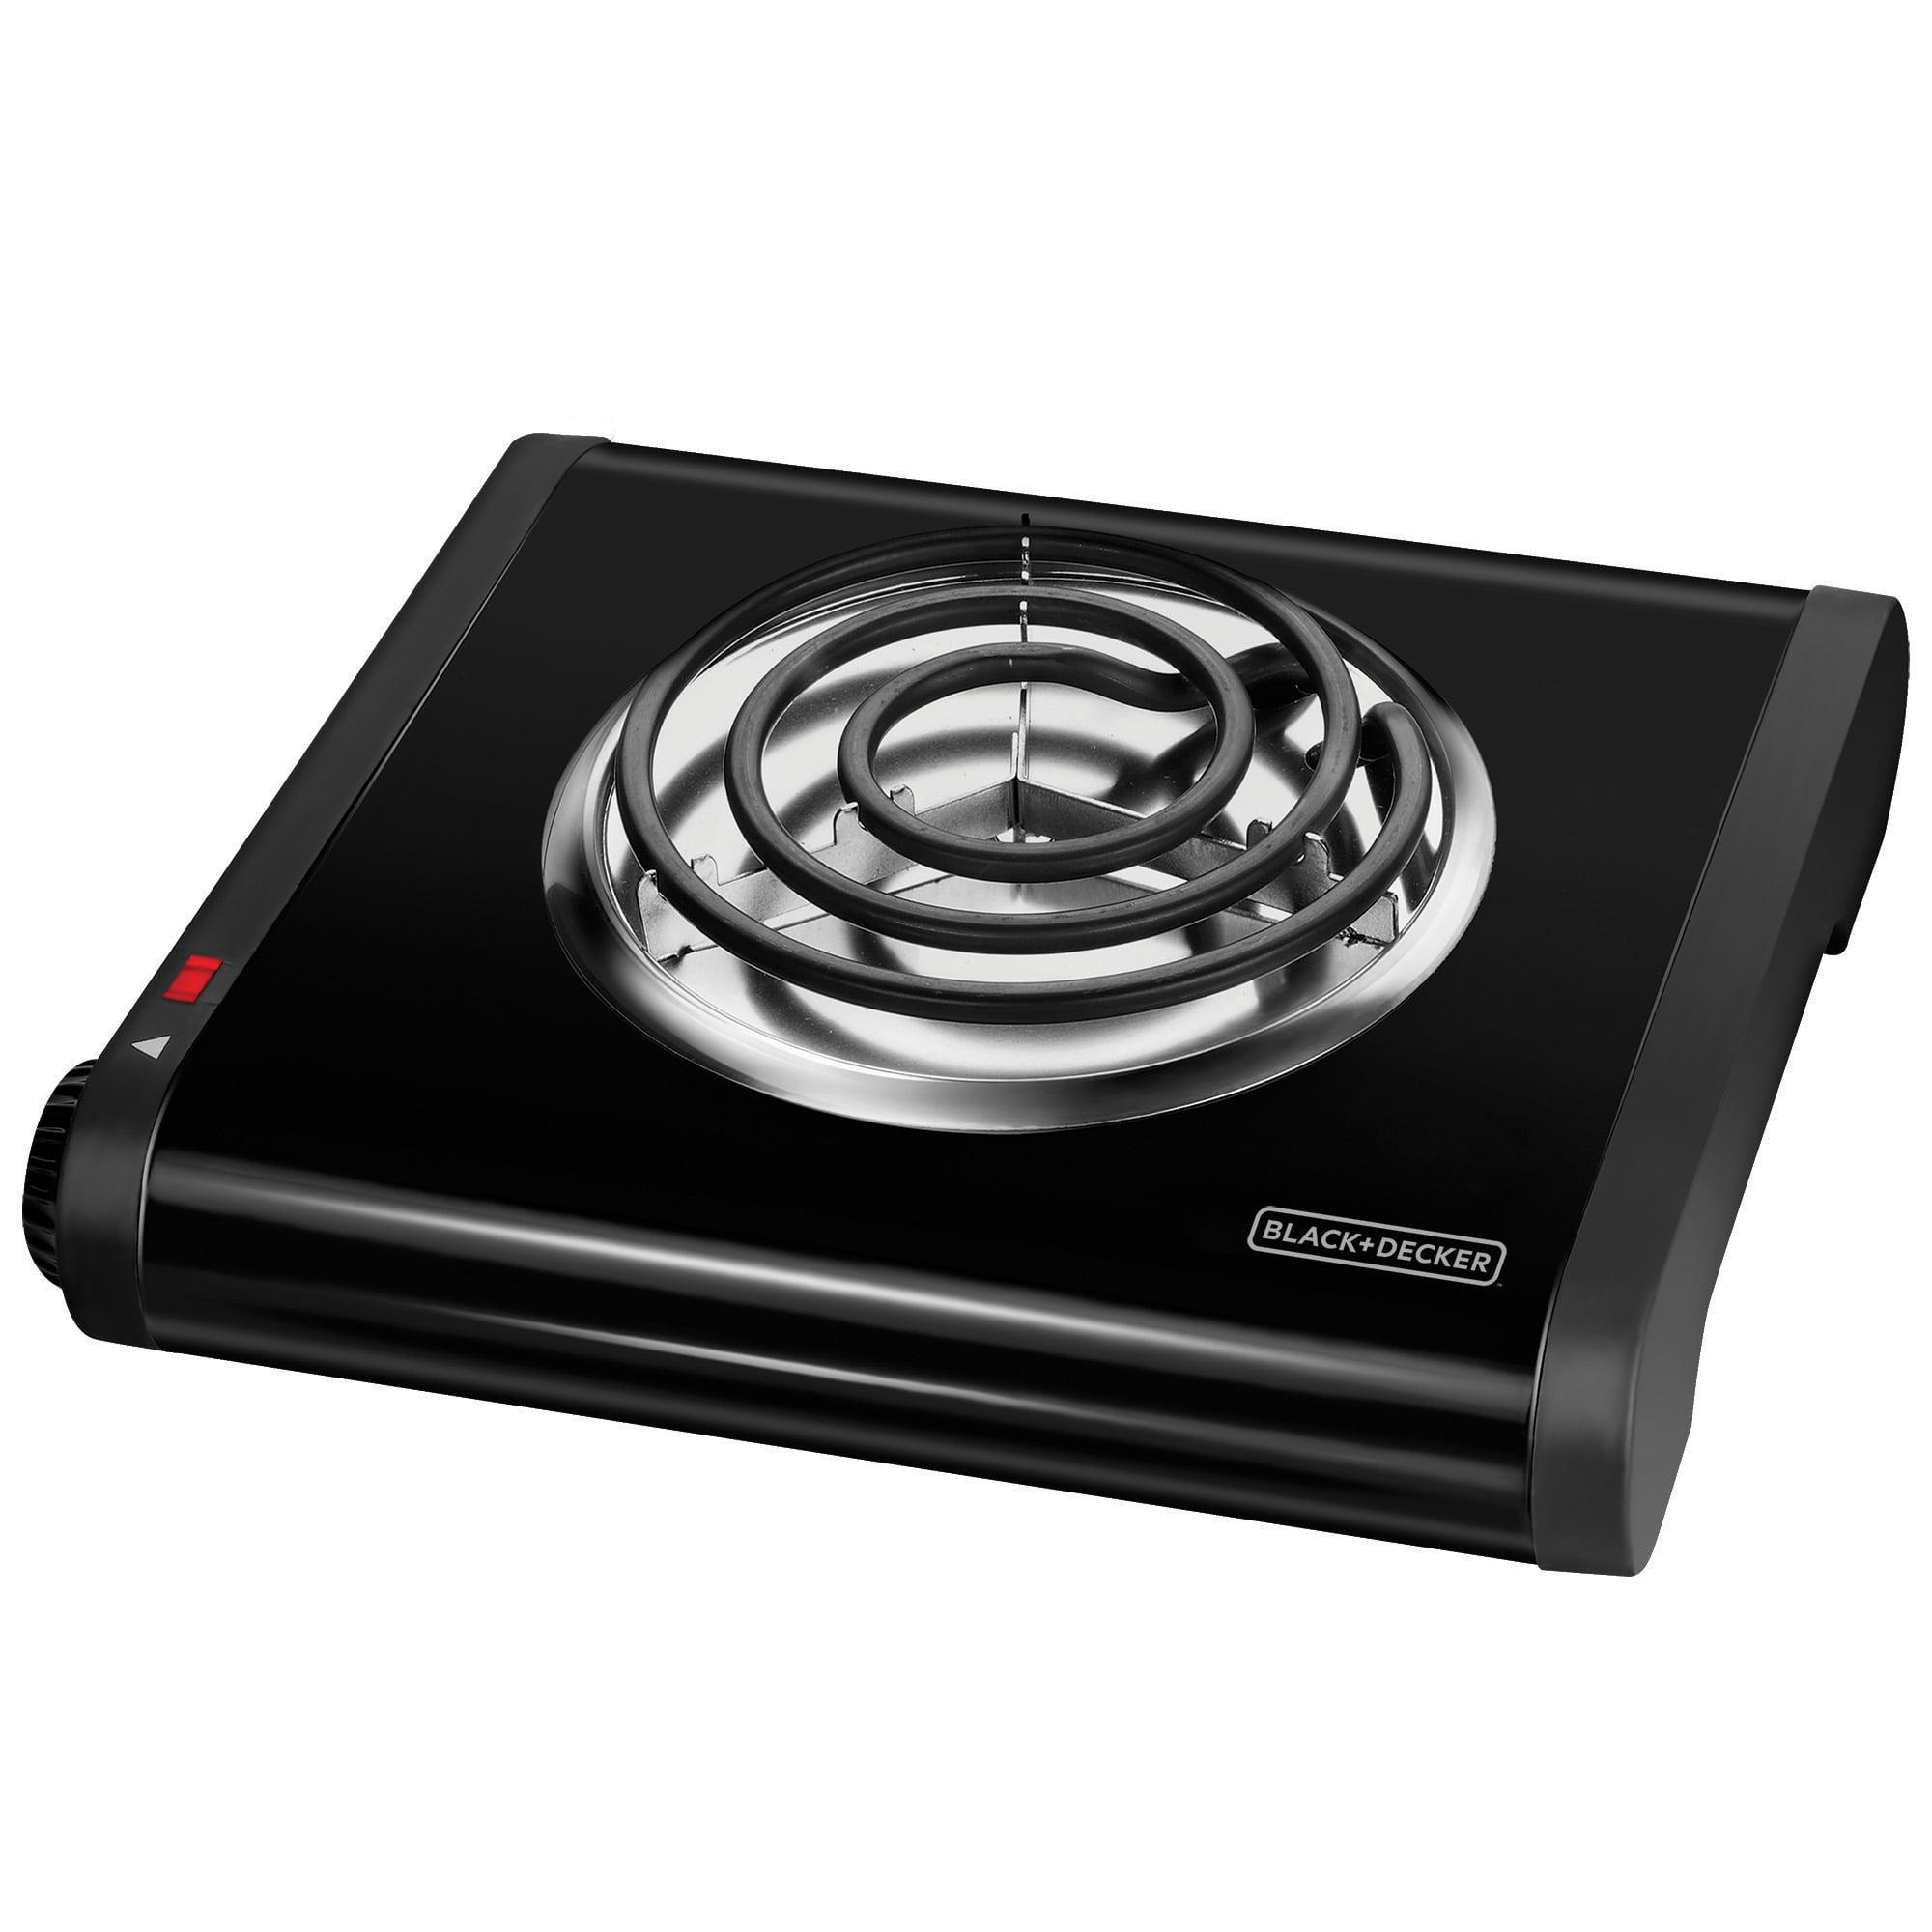 BLACK+DECKER Single Burner Portable Buffet Range, Black, SB1001B